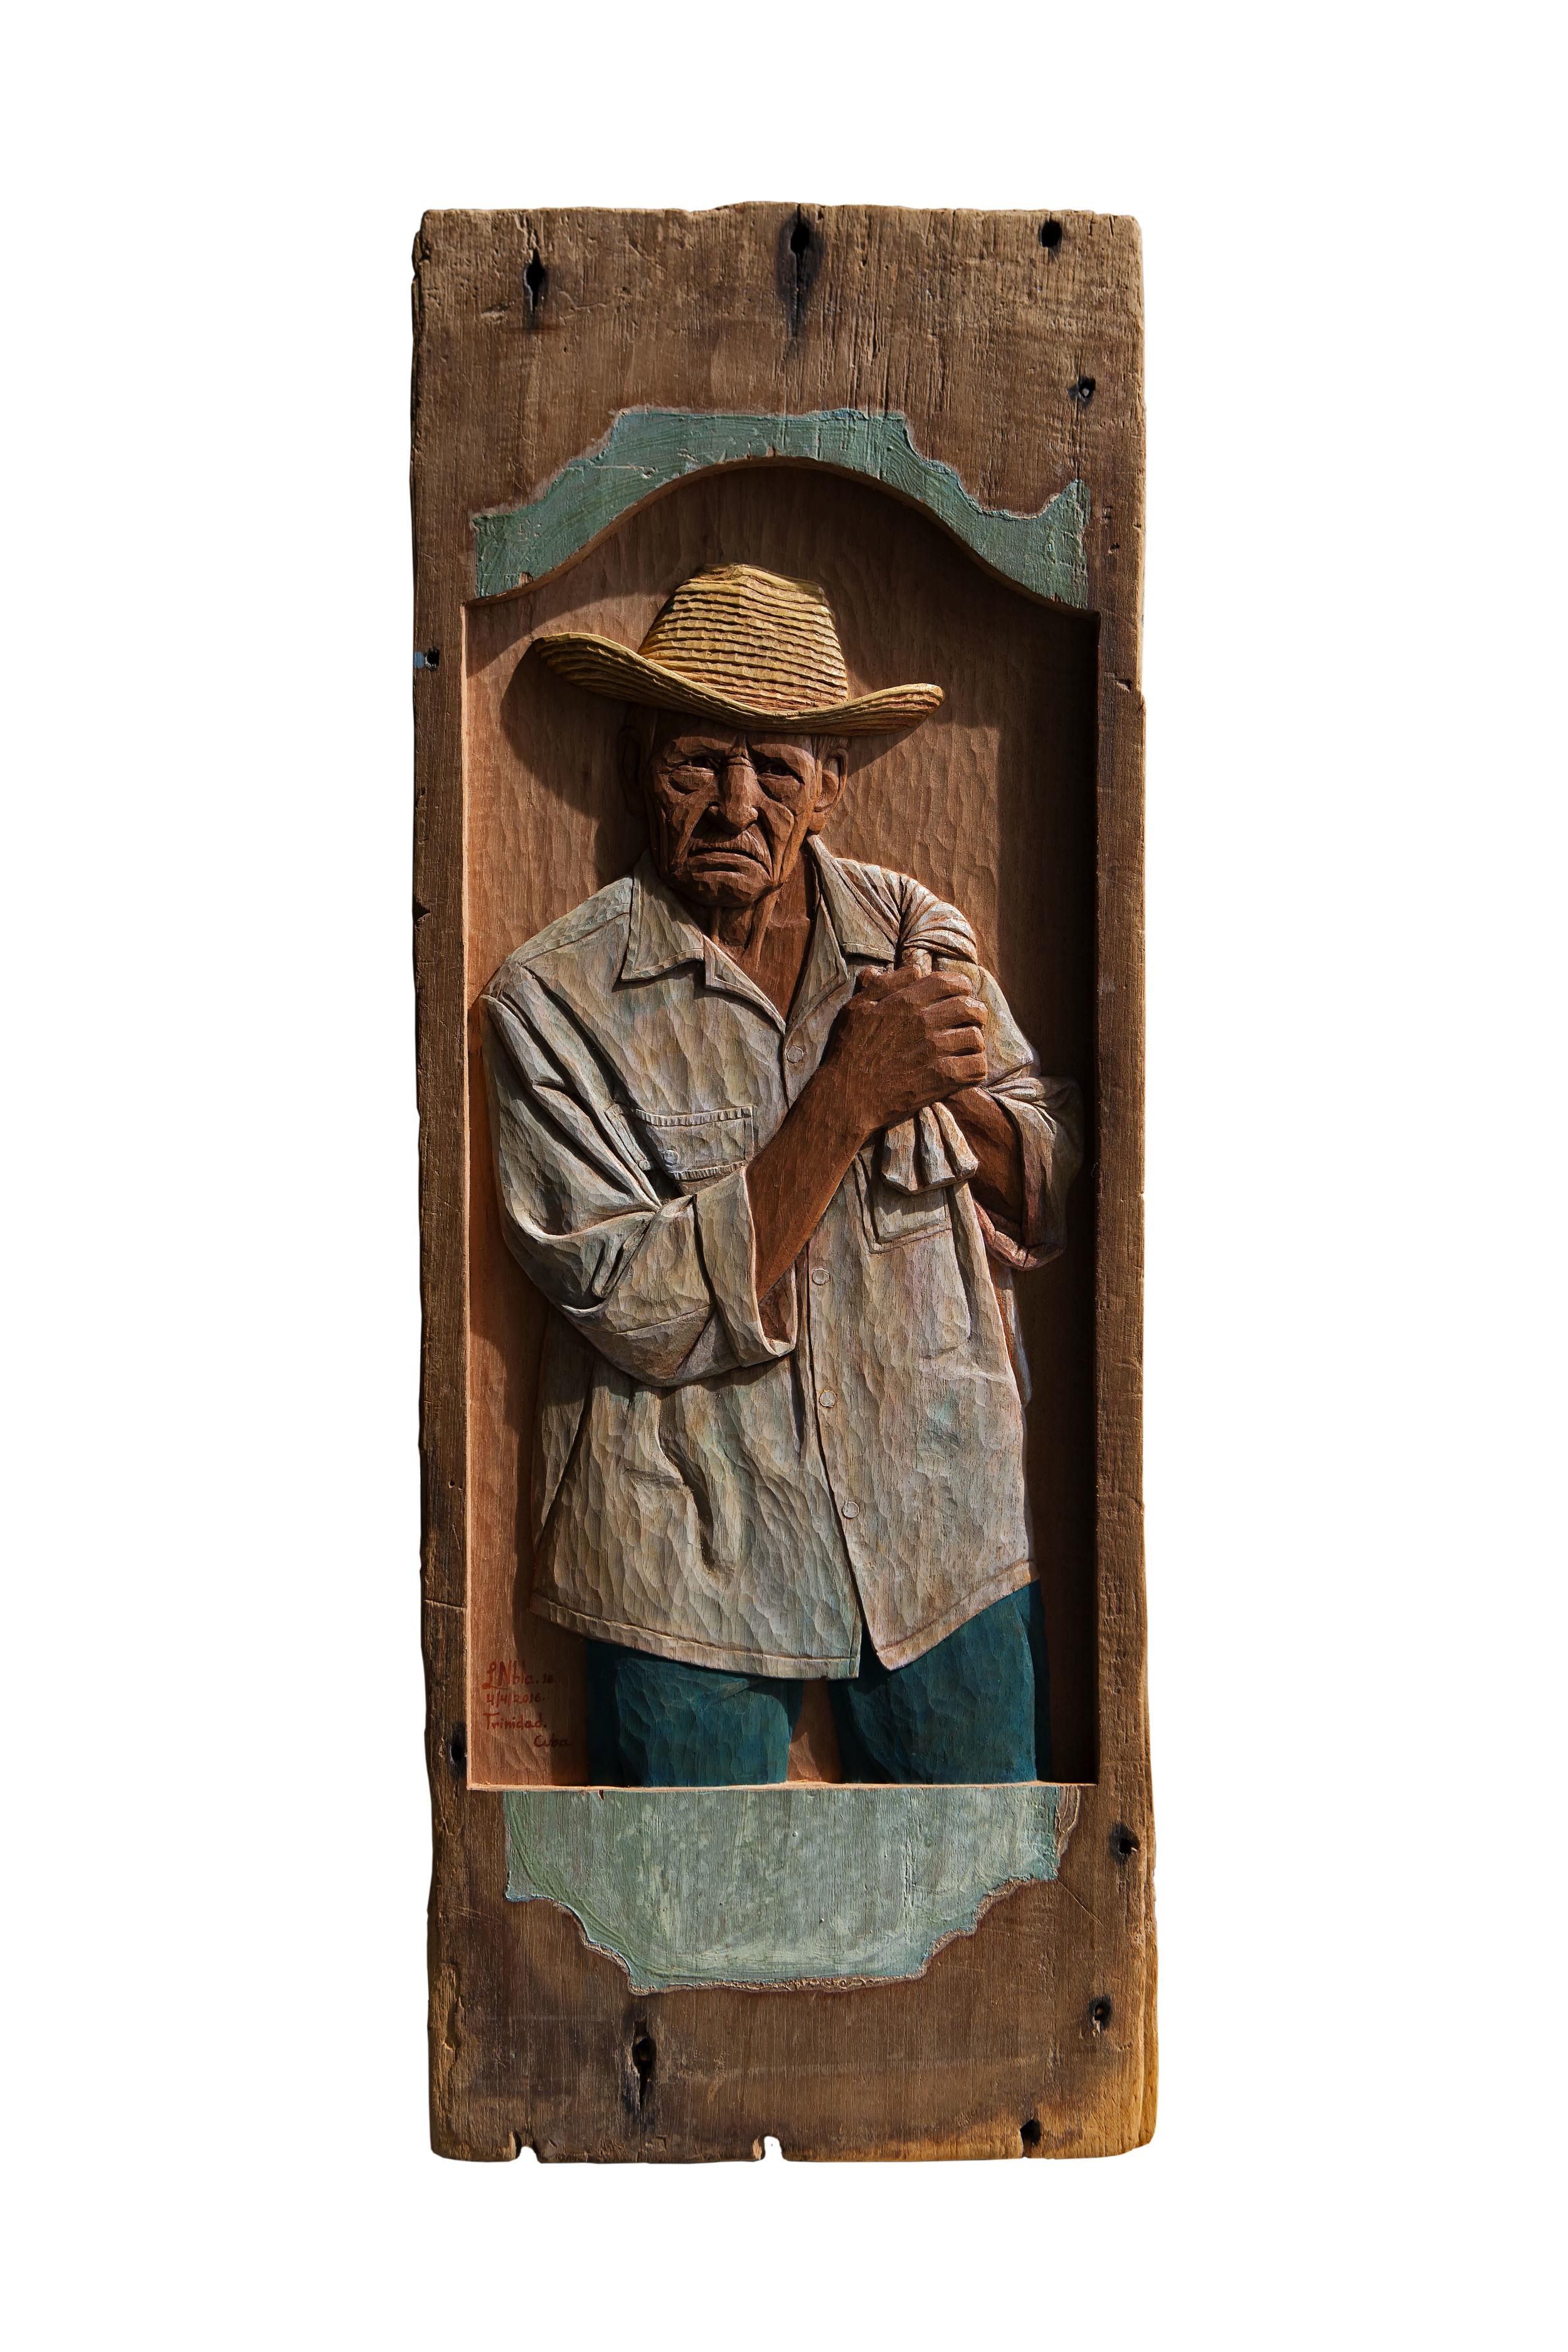 Justiliano Martínez Jaúrequi - $6000 93.5 x 34 cm 2016